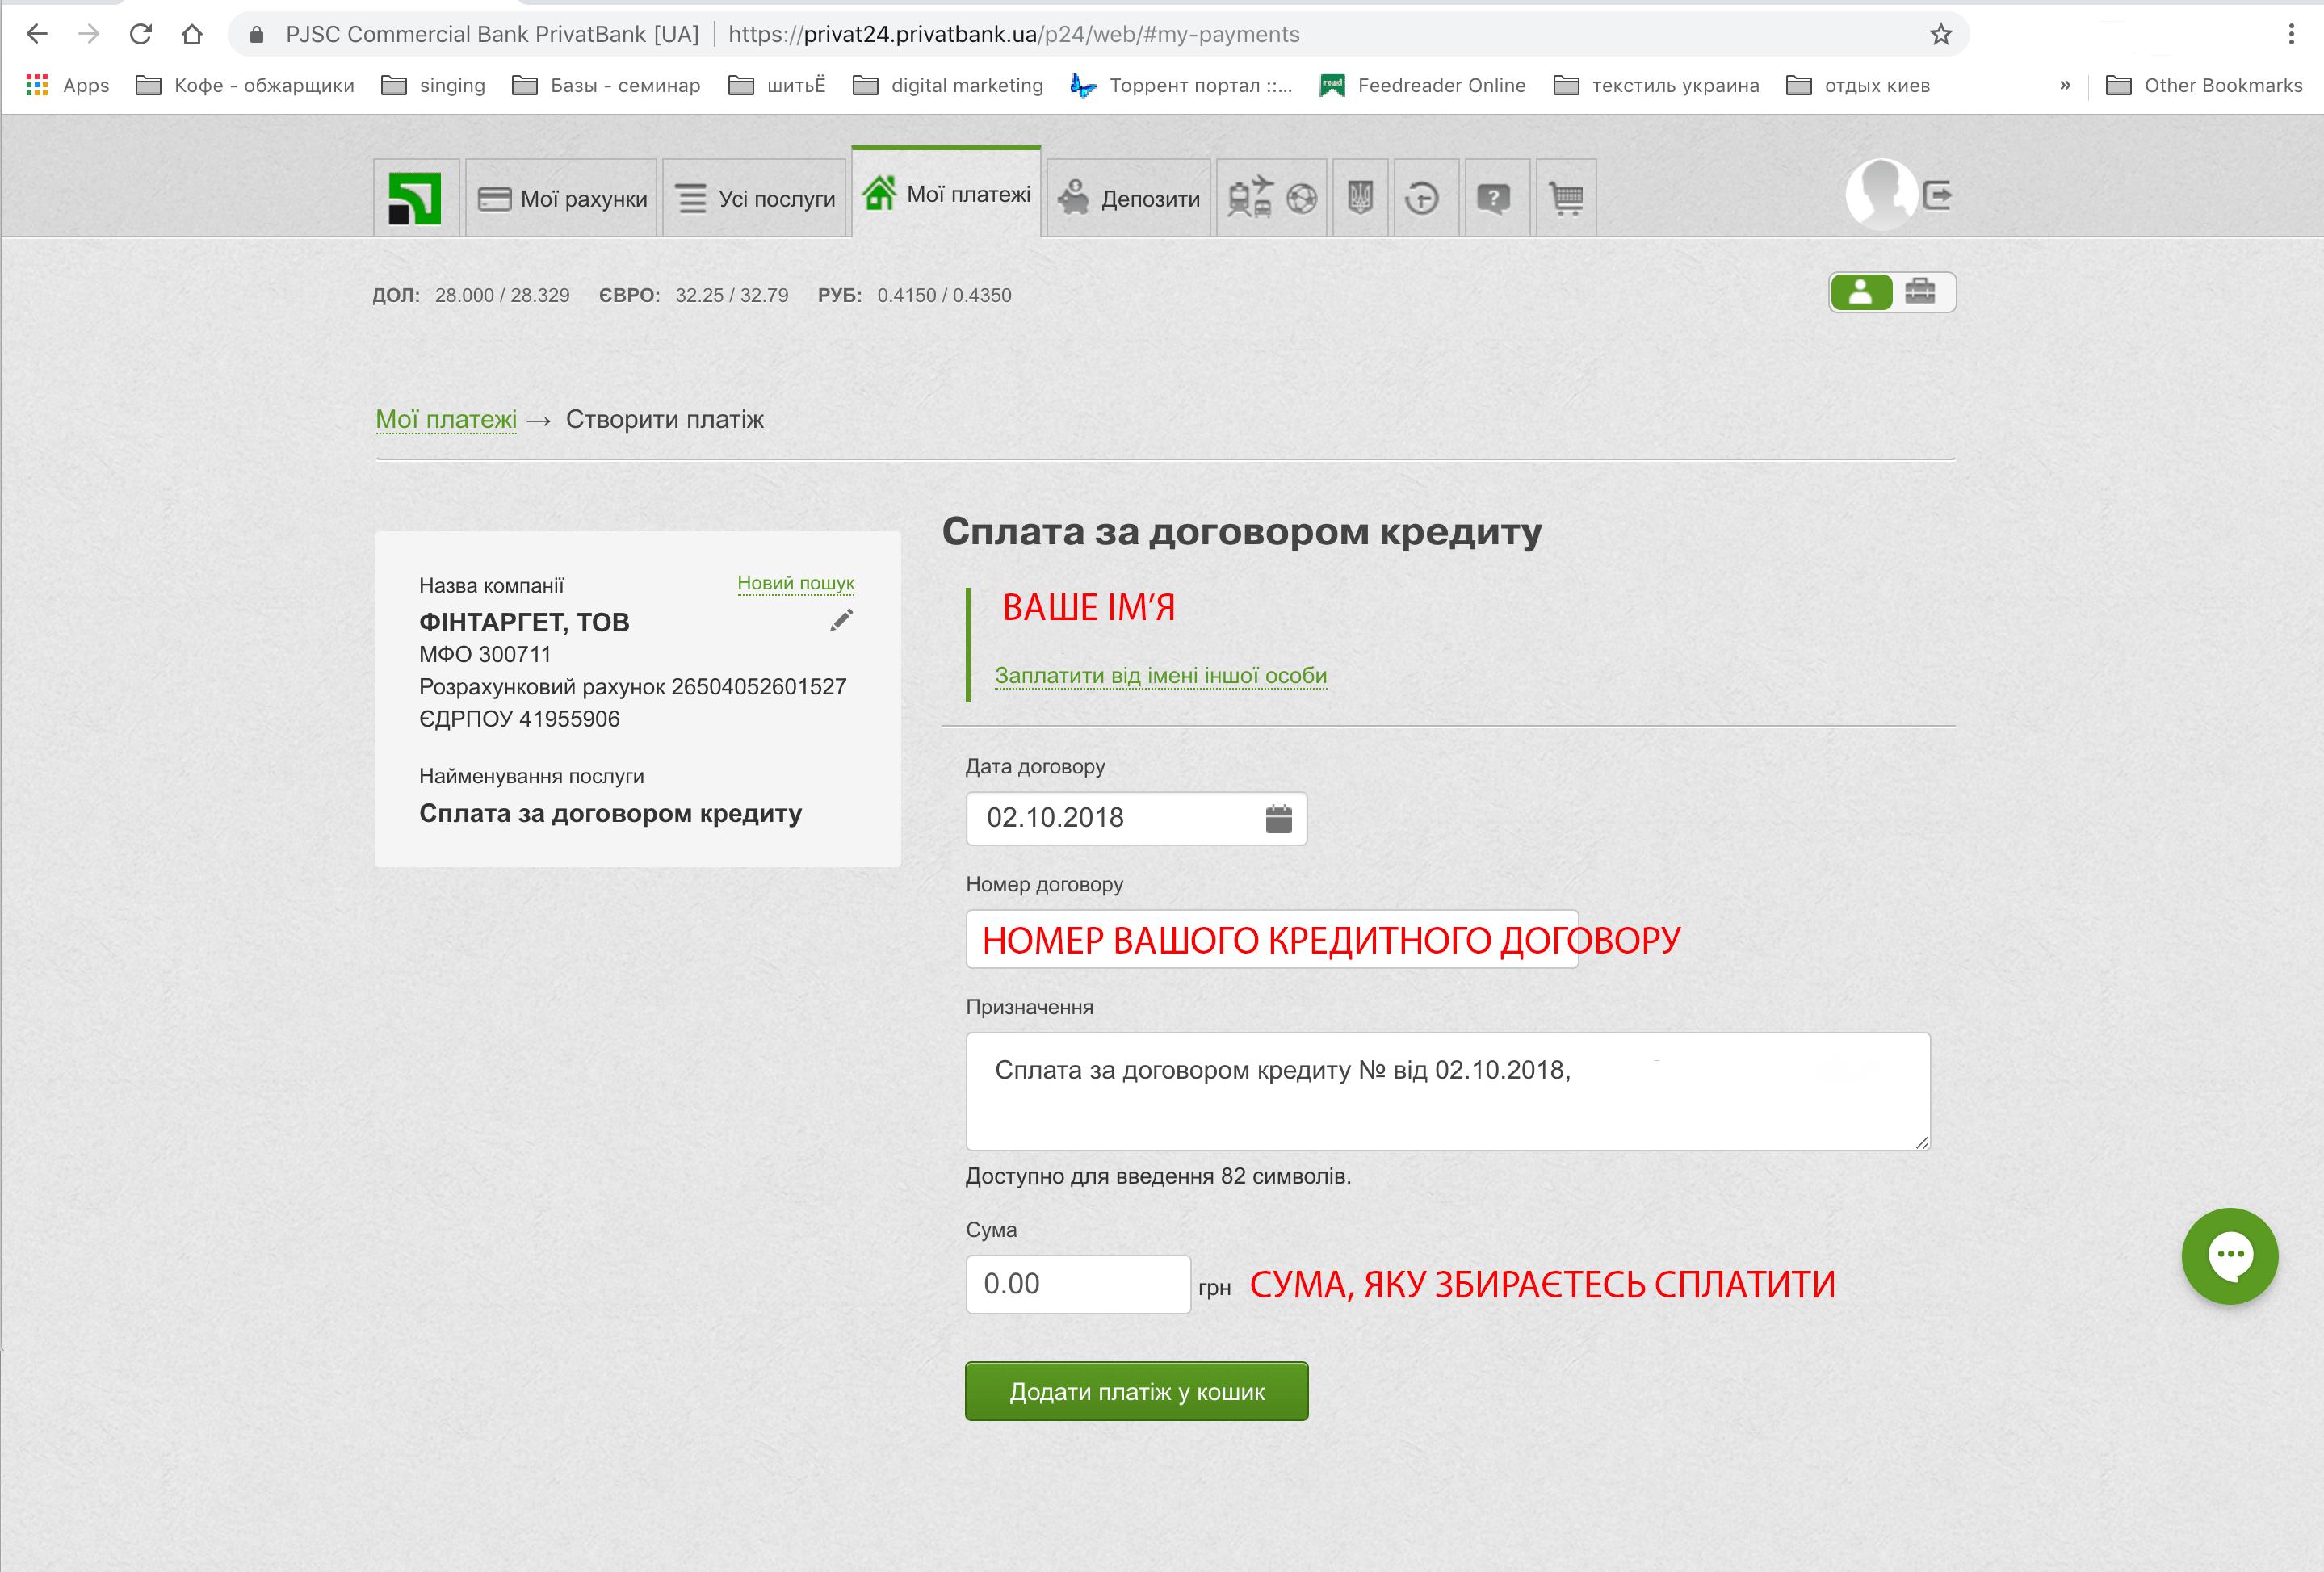 Сплата позики microcash за допомогою Приват24, шаг 3